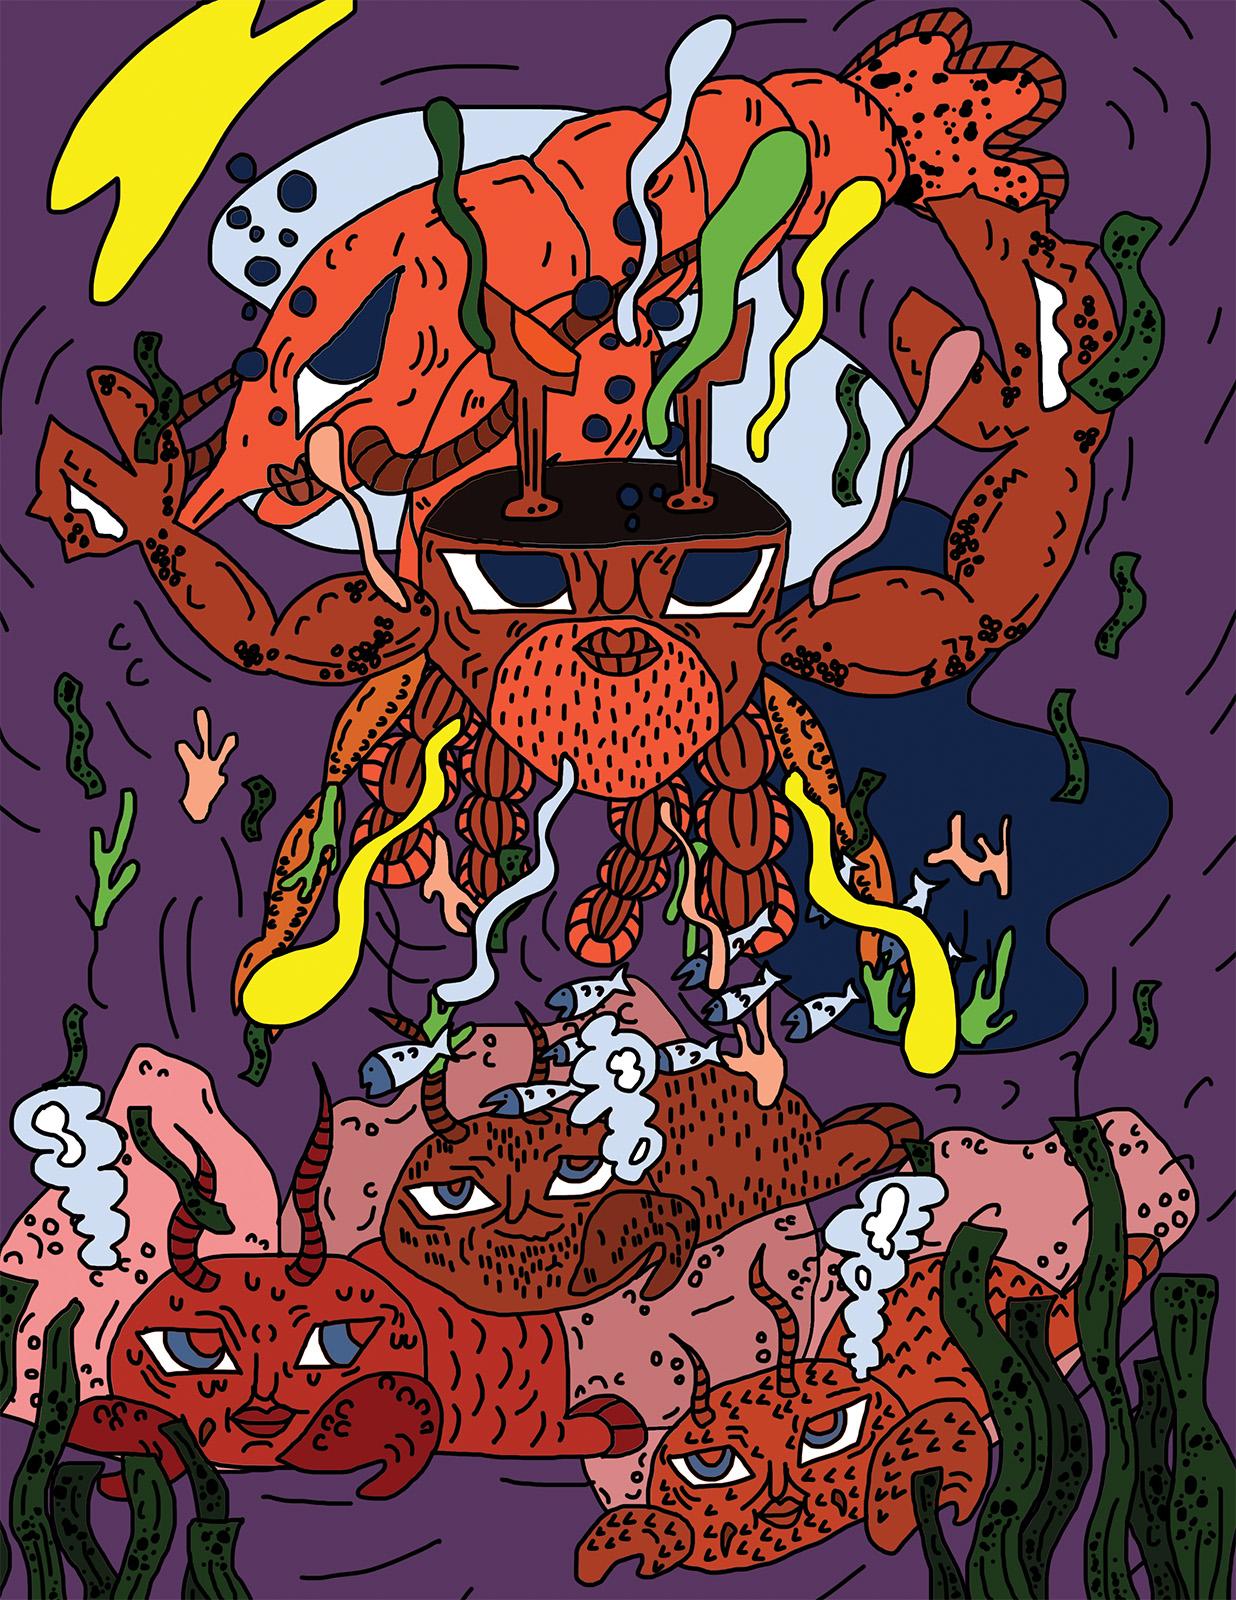 Illustration by Seung Gyu Kim